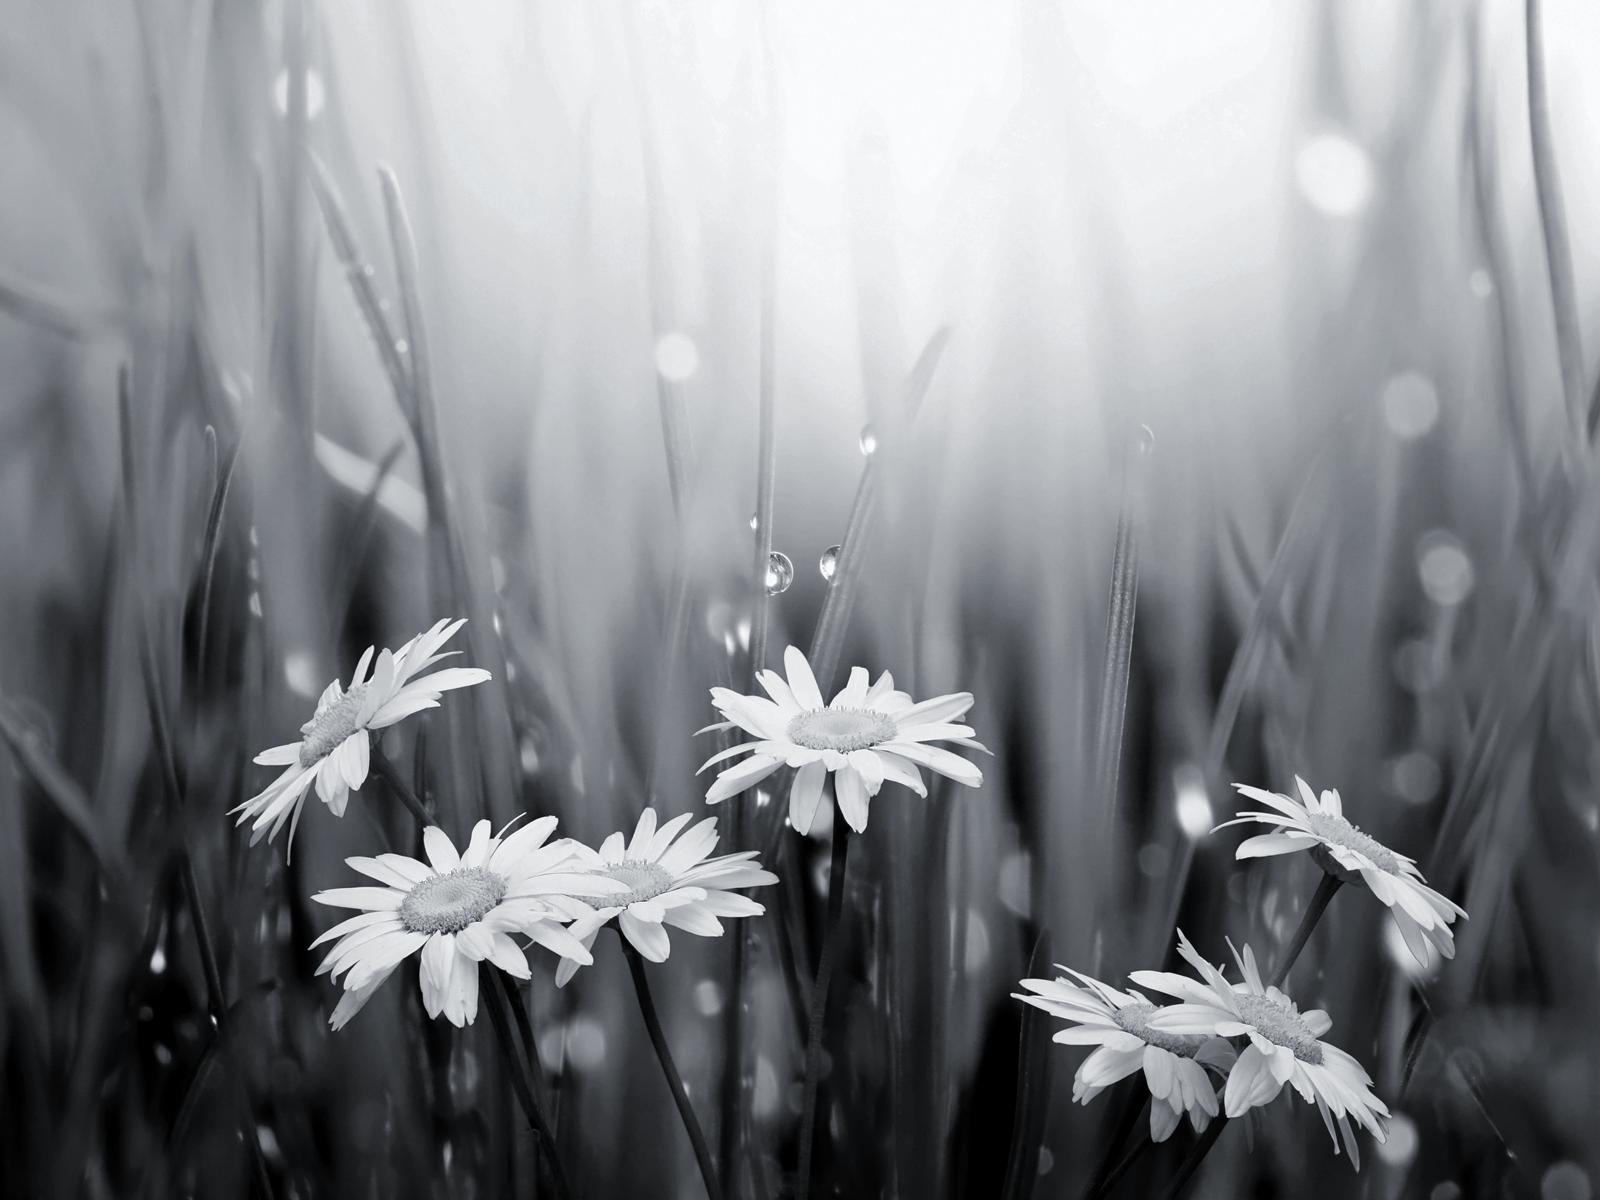 Black and White Flowers Wallpaper WallpaperSafari